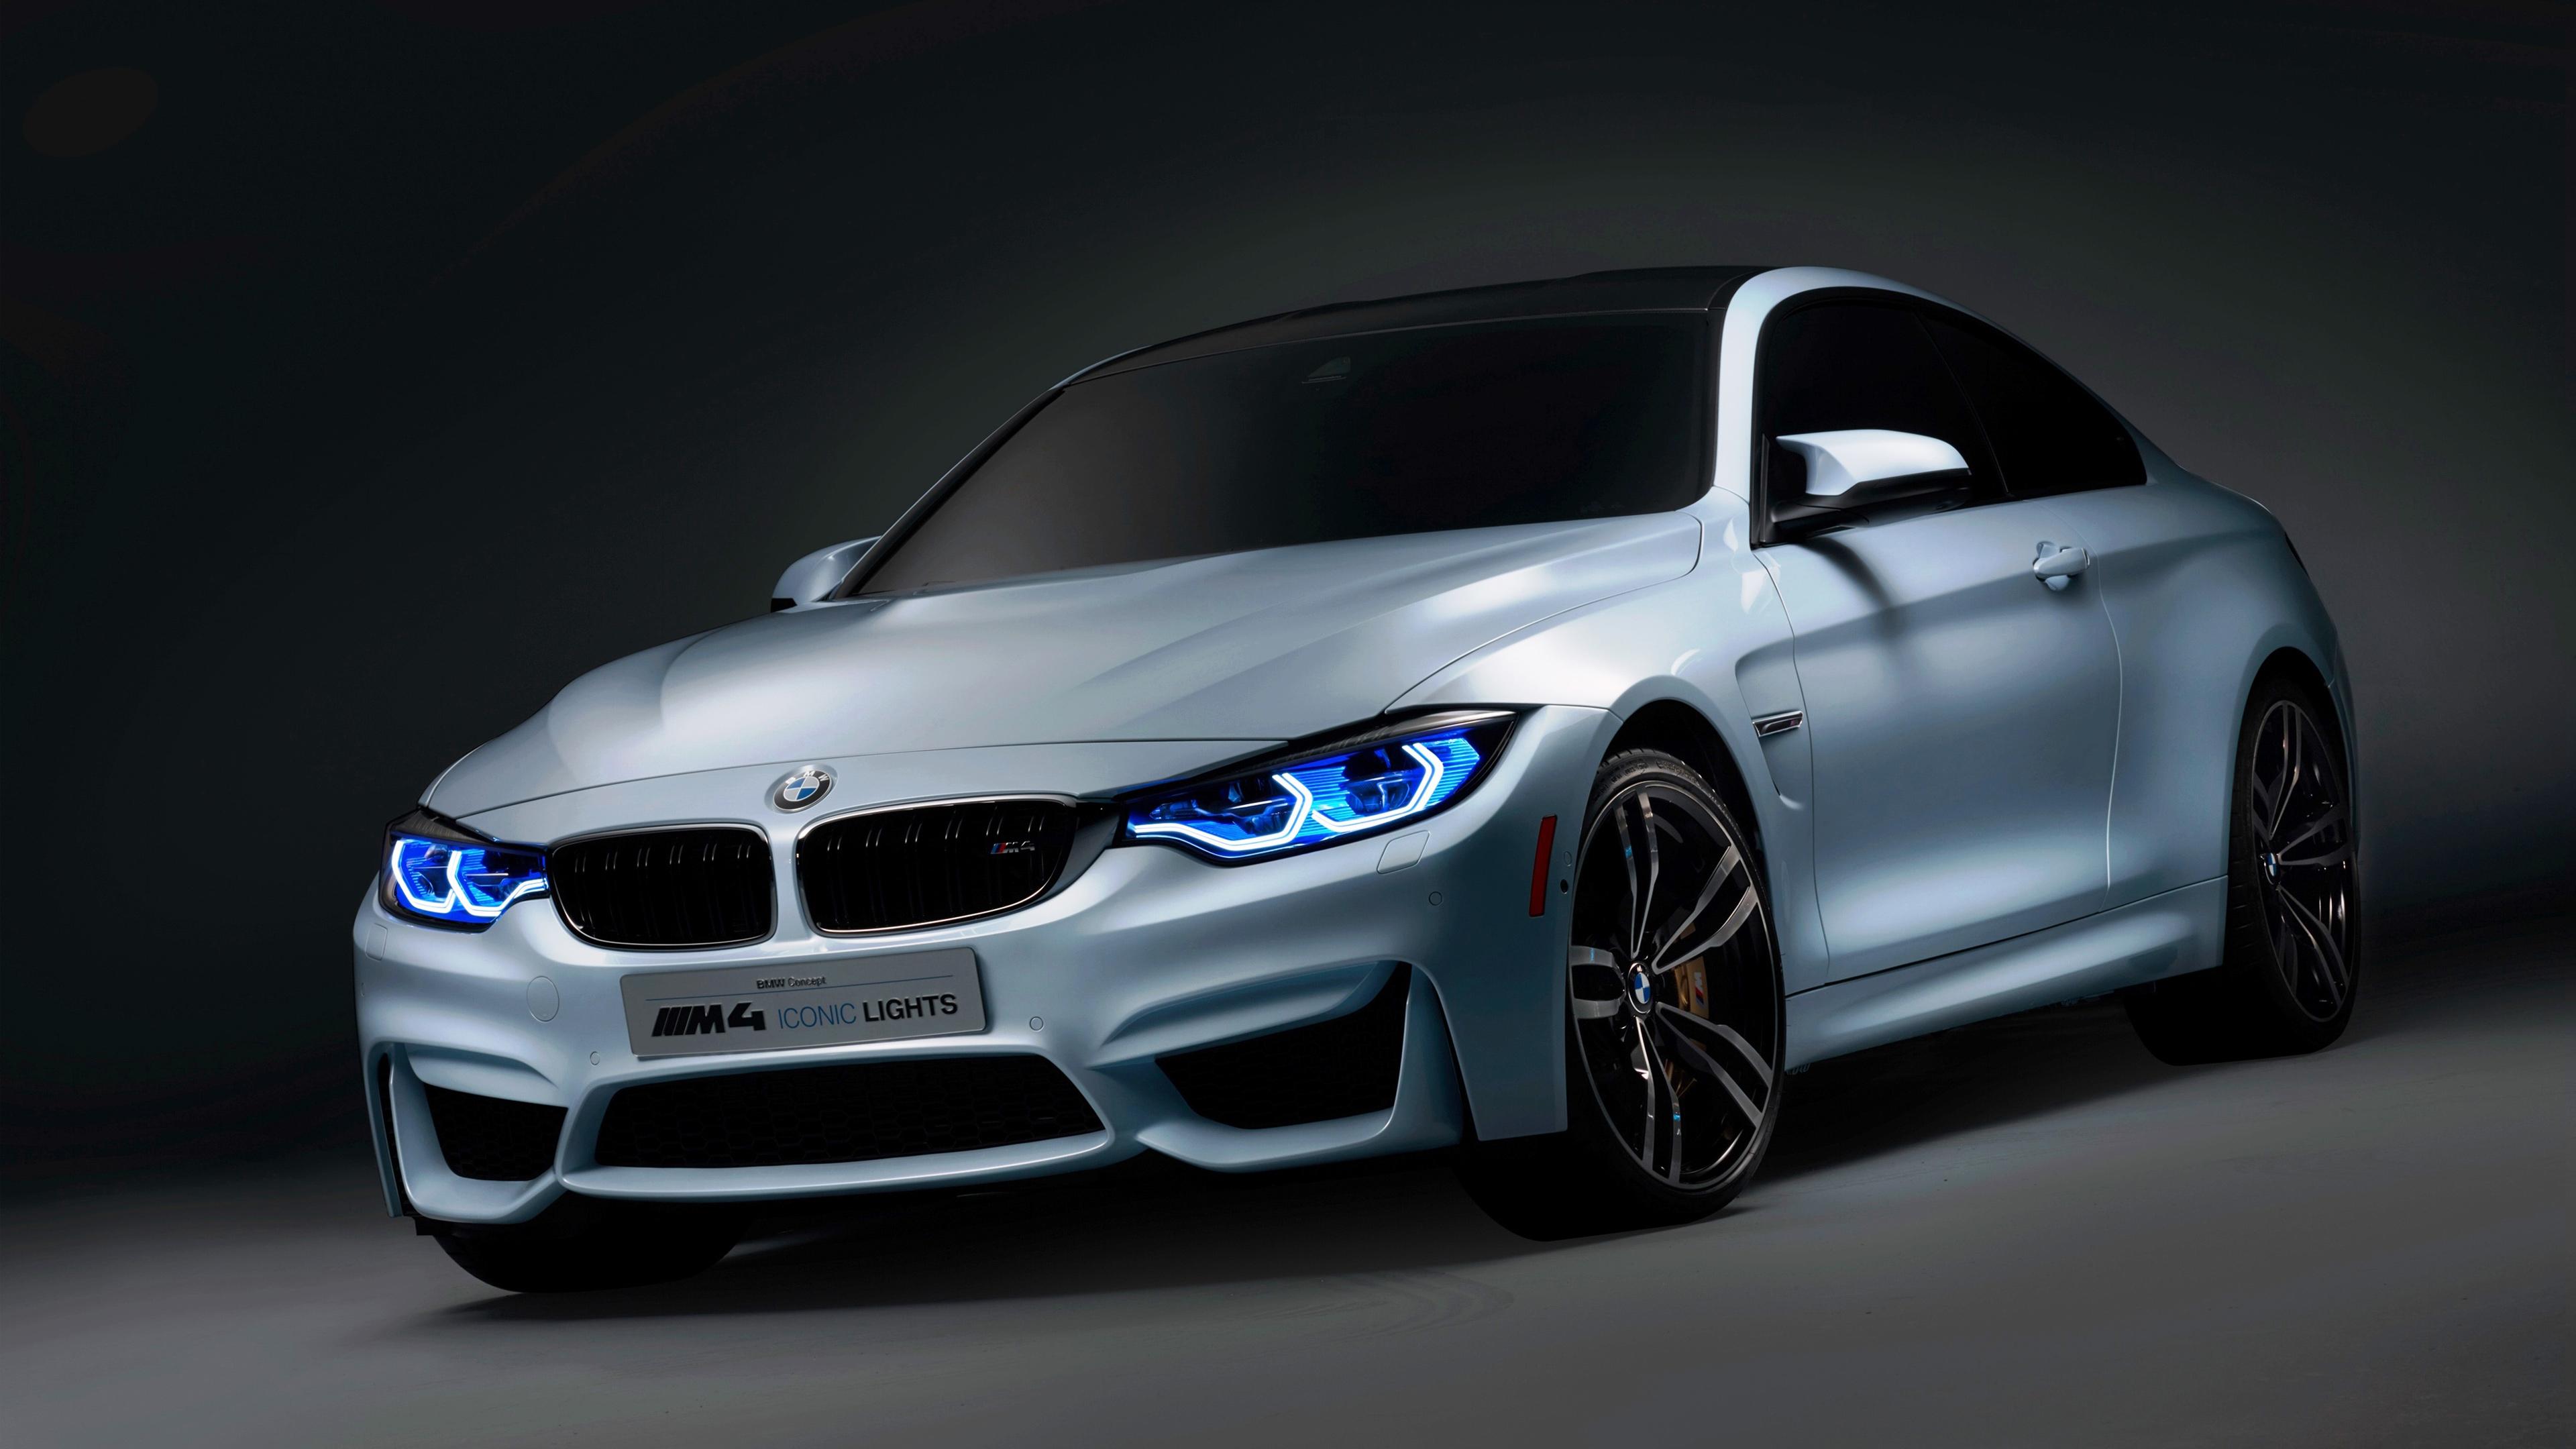 BMW Iconic Lights 4K Wallpaper | HD Car Wallpapers | ID #7099